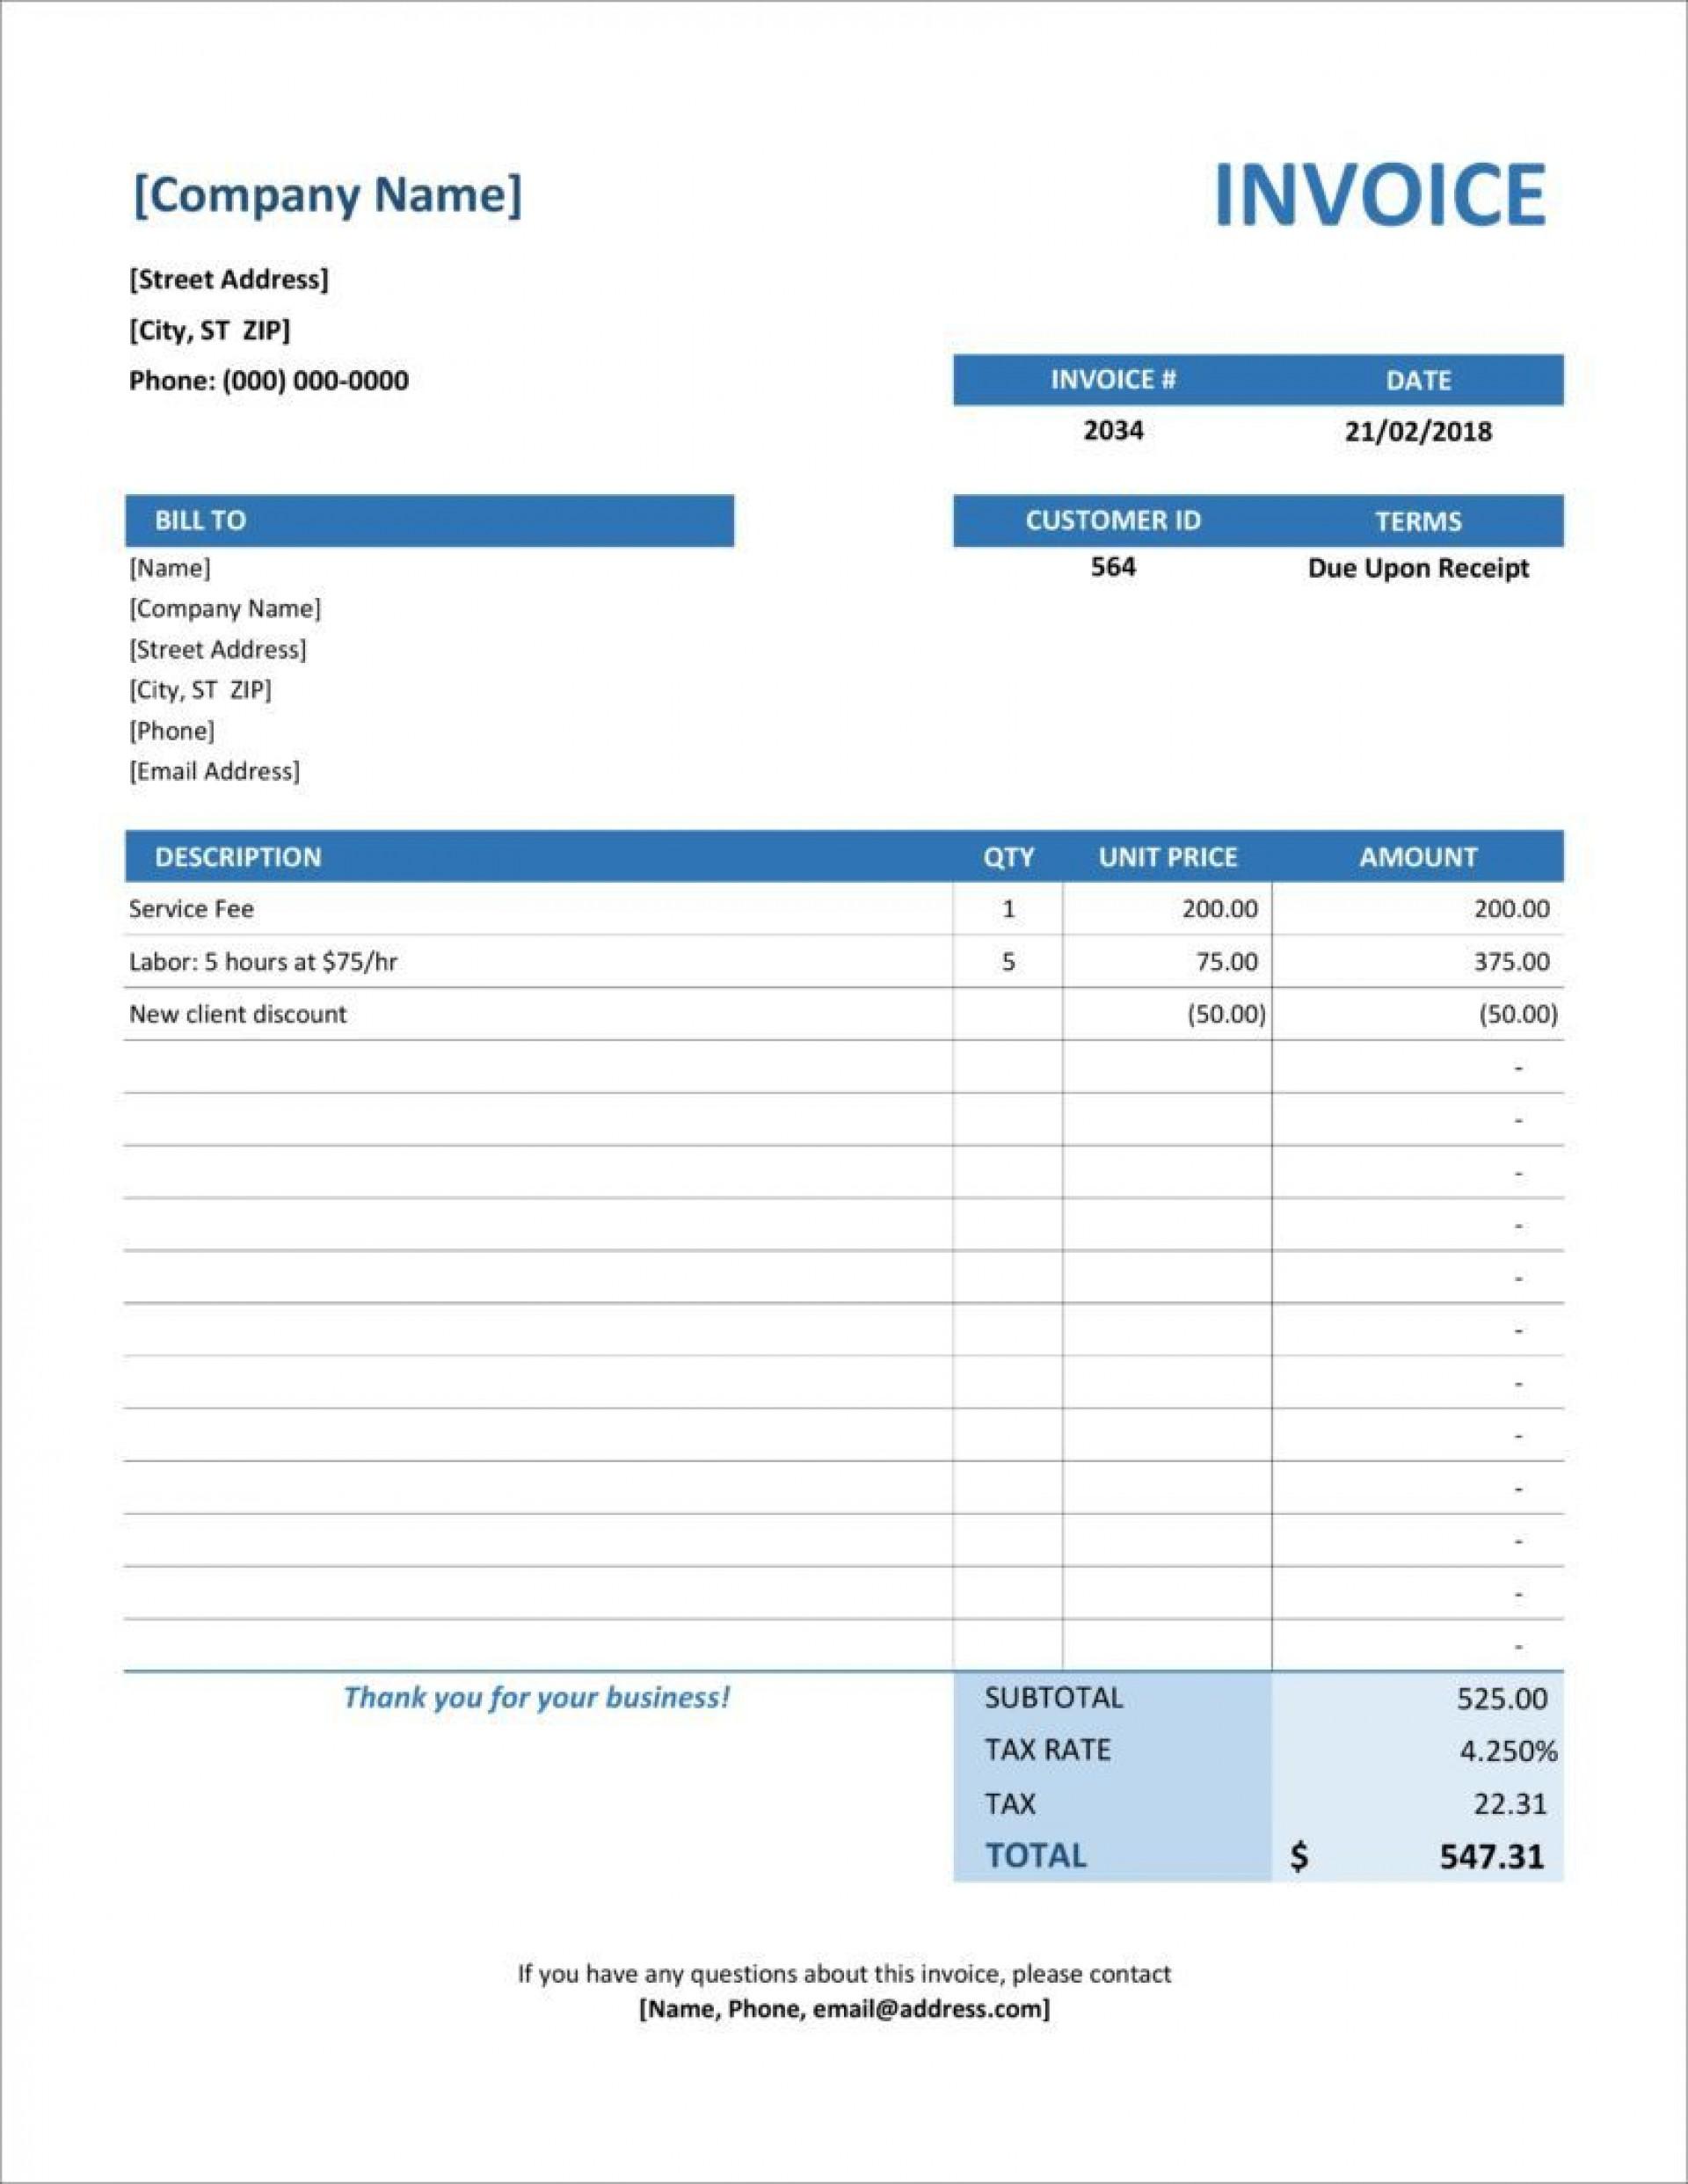 004 Striking Microsoft Excel Invoice Template Image  Gst Uk Proforma1920